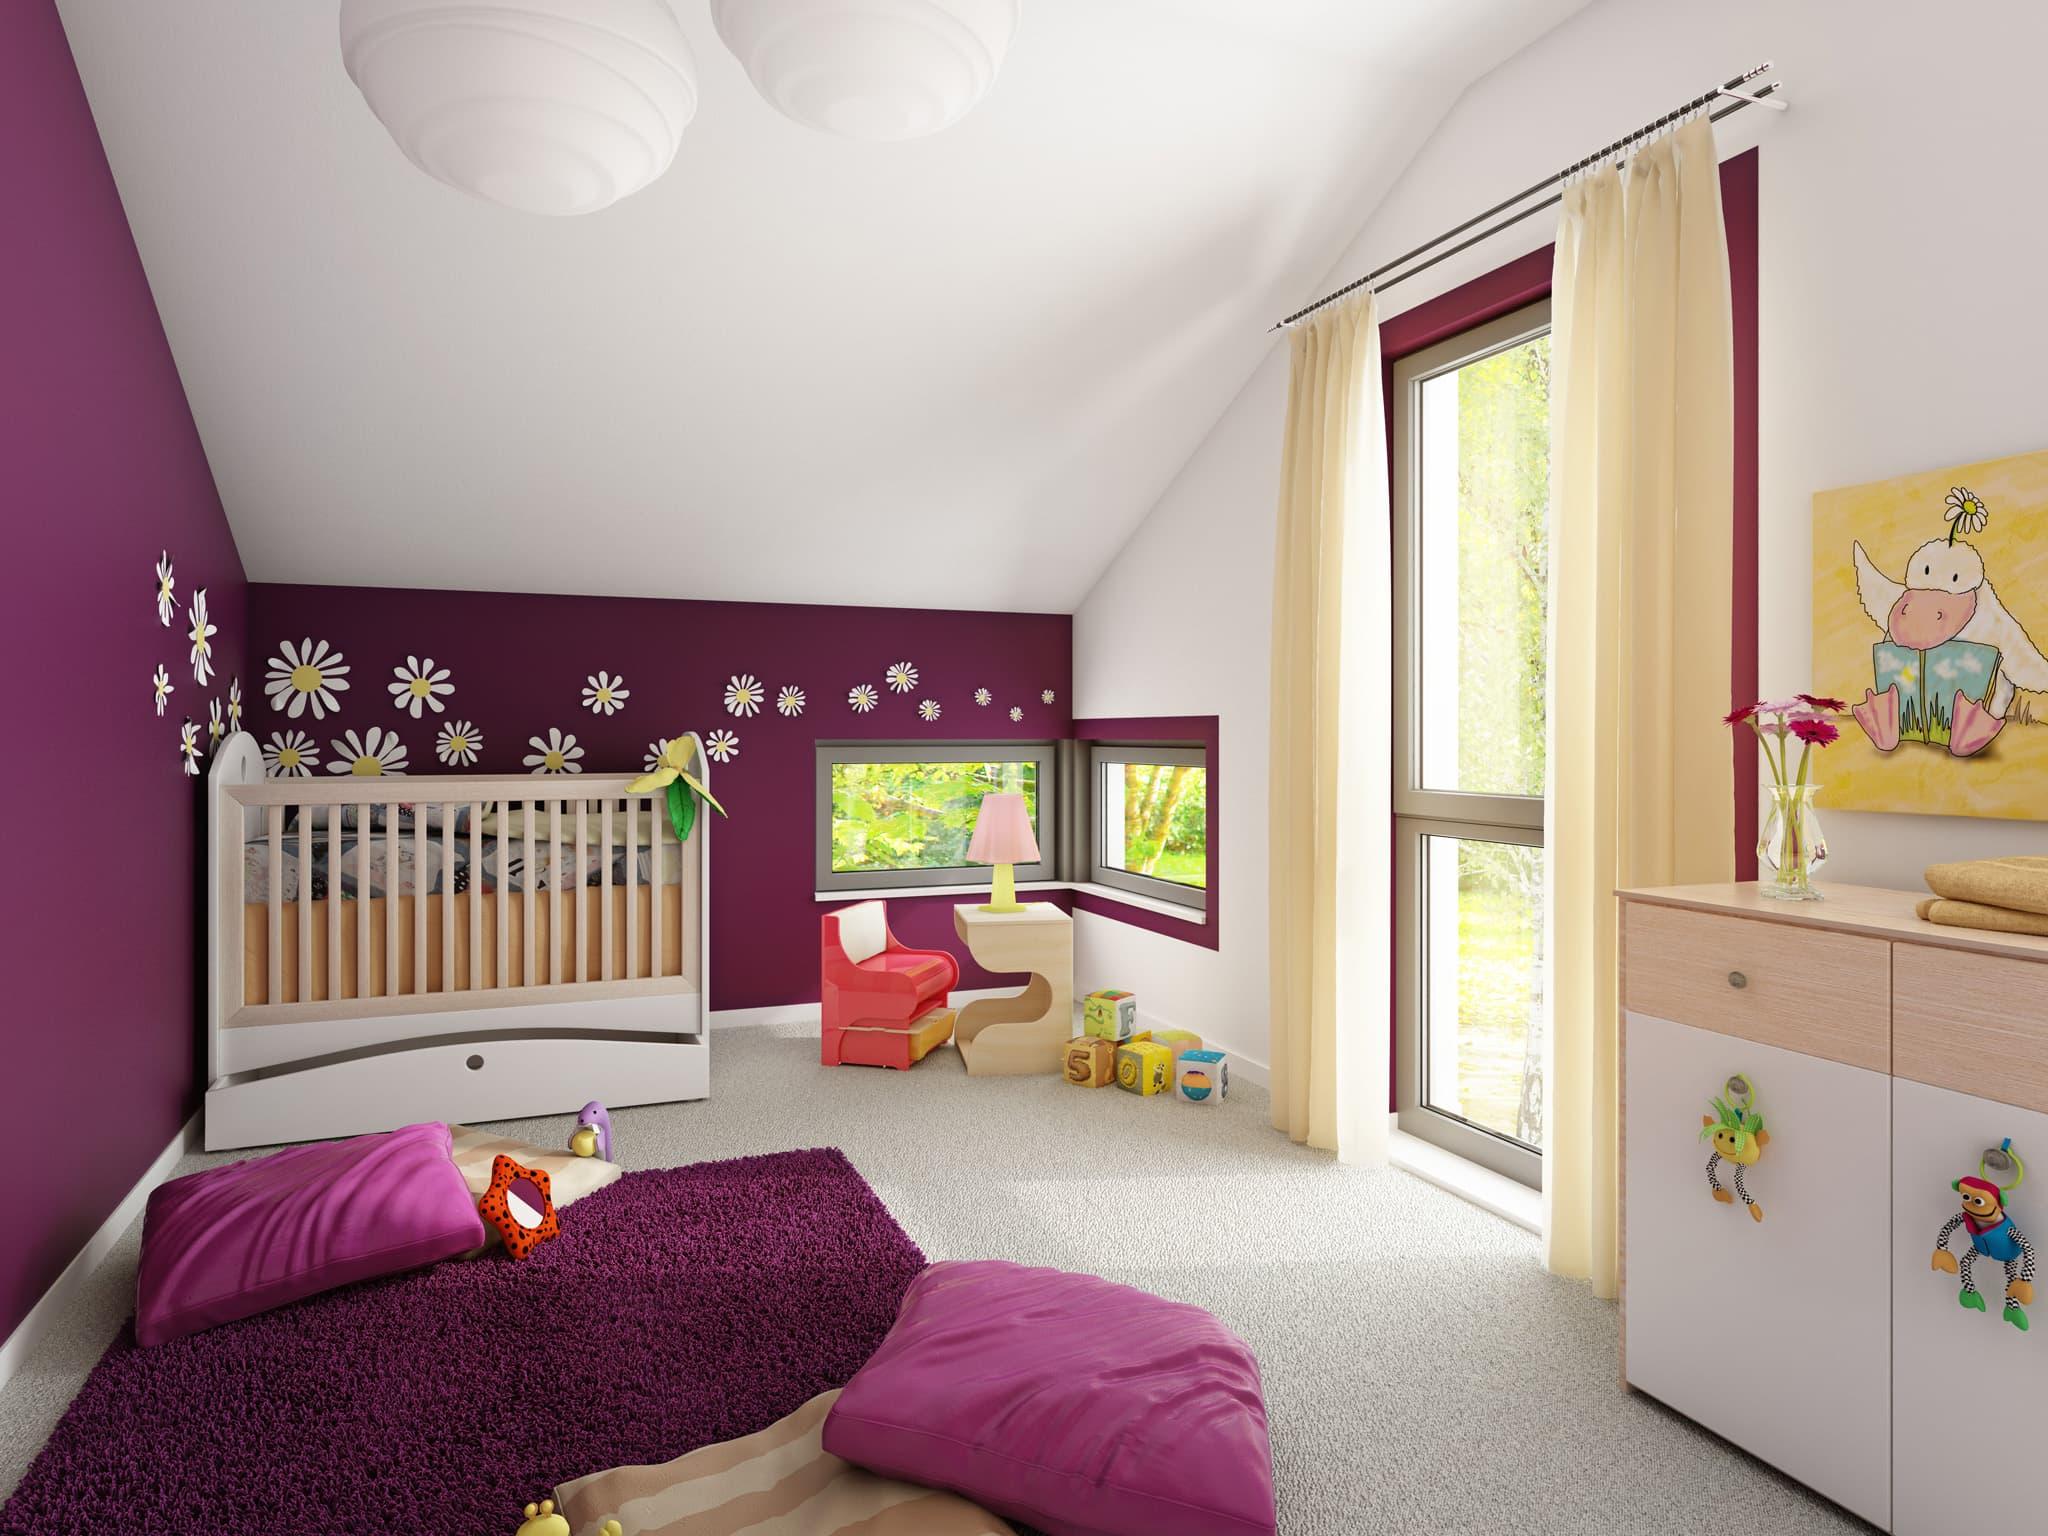 Kinderzimmer Ideen - Inneneinrichtung Fertighaus SOLUTION 204 V4 von Living Haus - HausbauDirekt.de